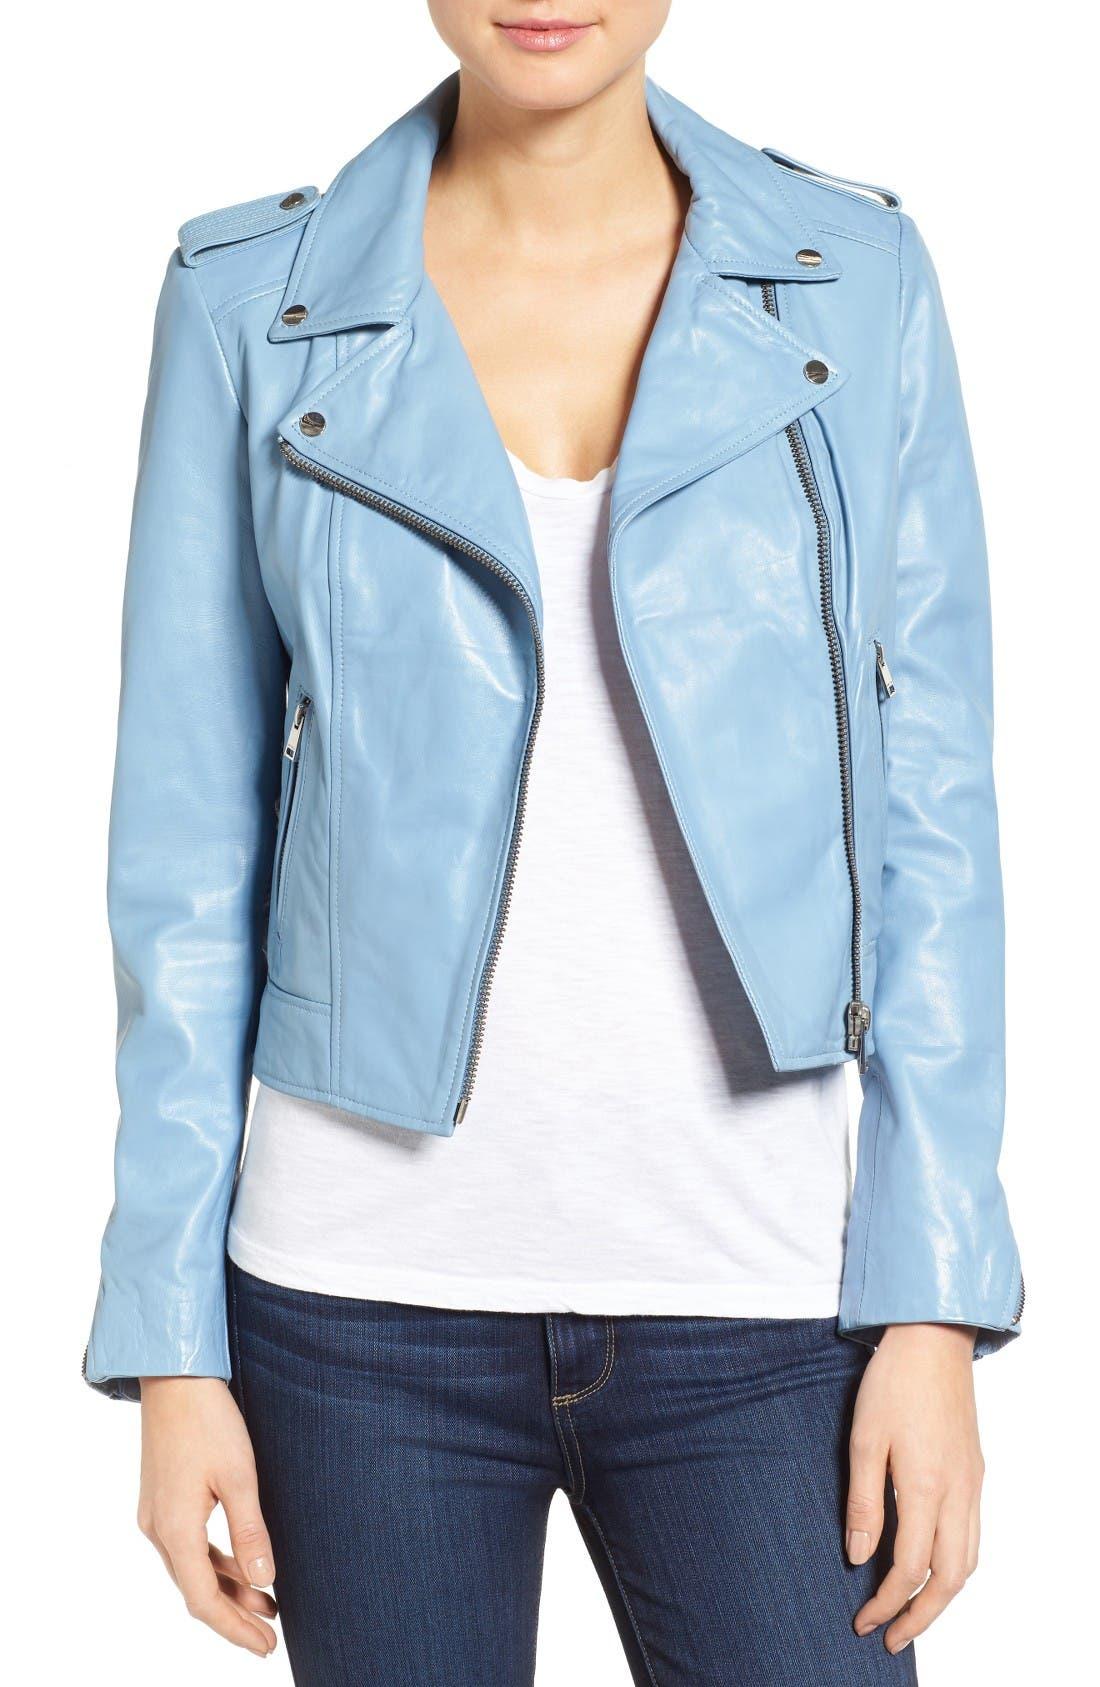 Donna Lambskin Leather Moto Jacket,                         Main,                         color, Powder Blue